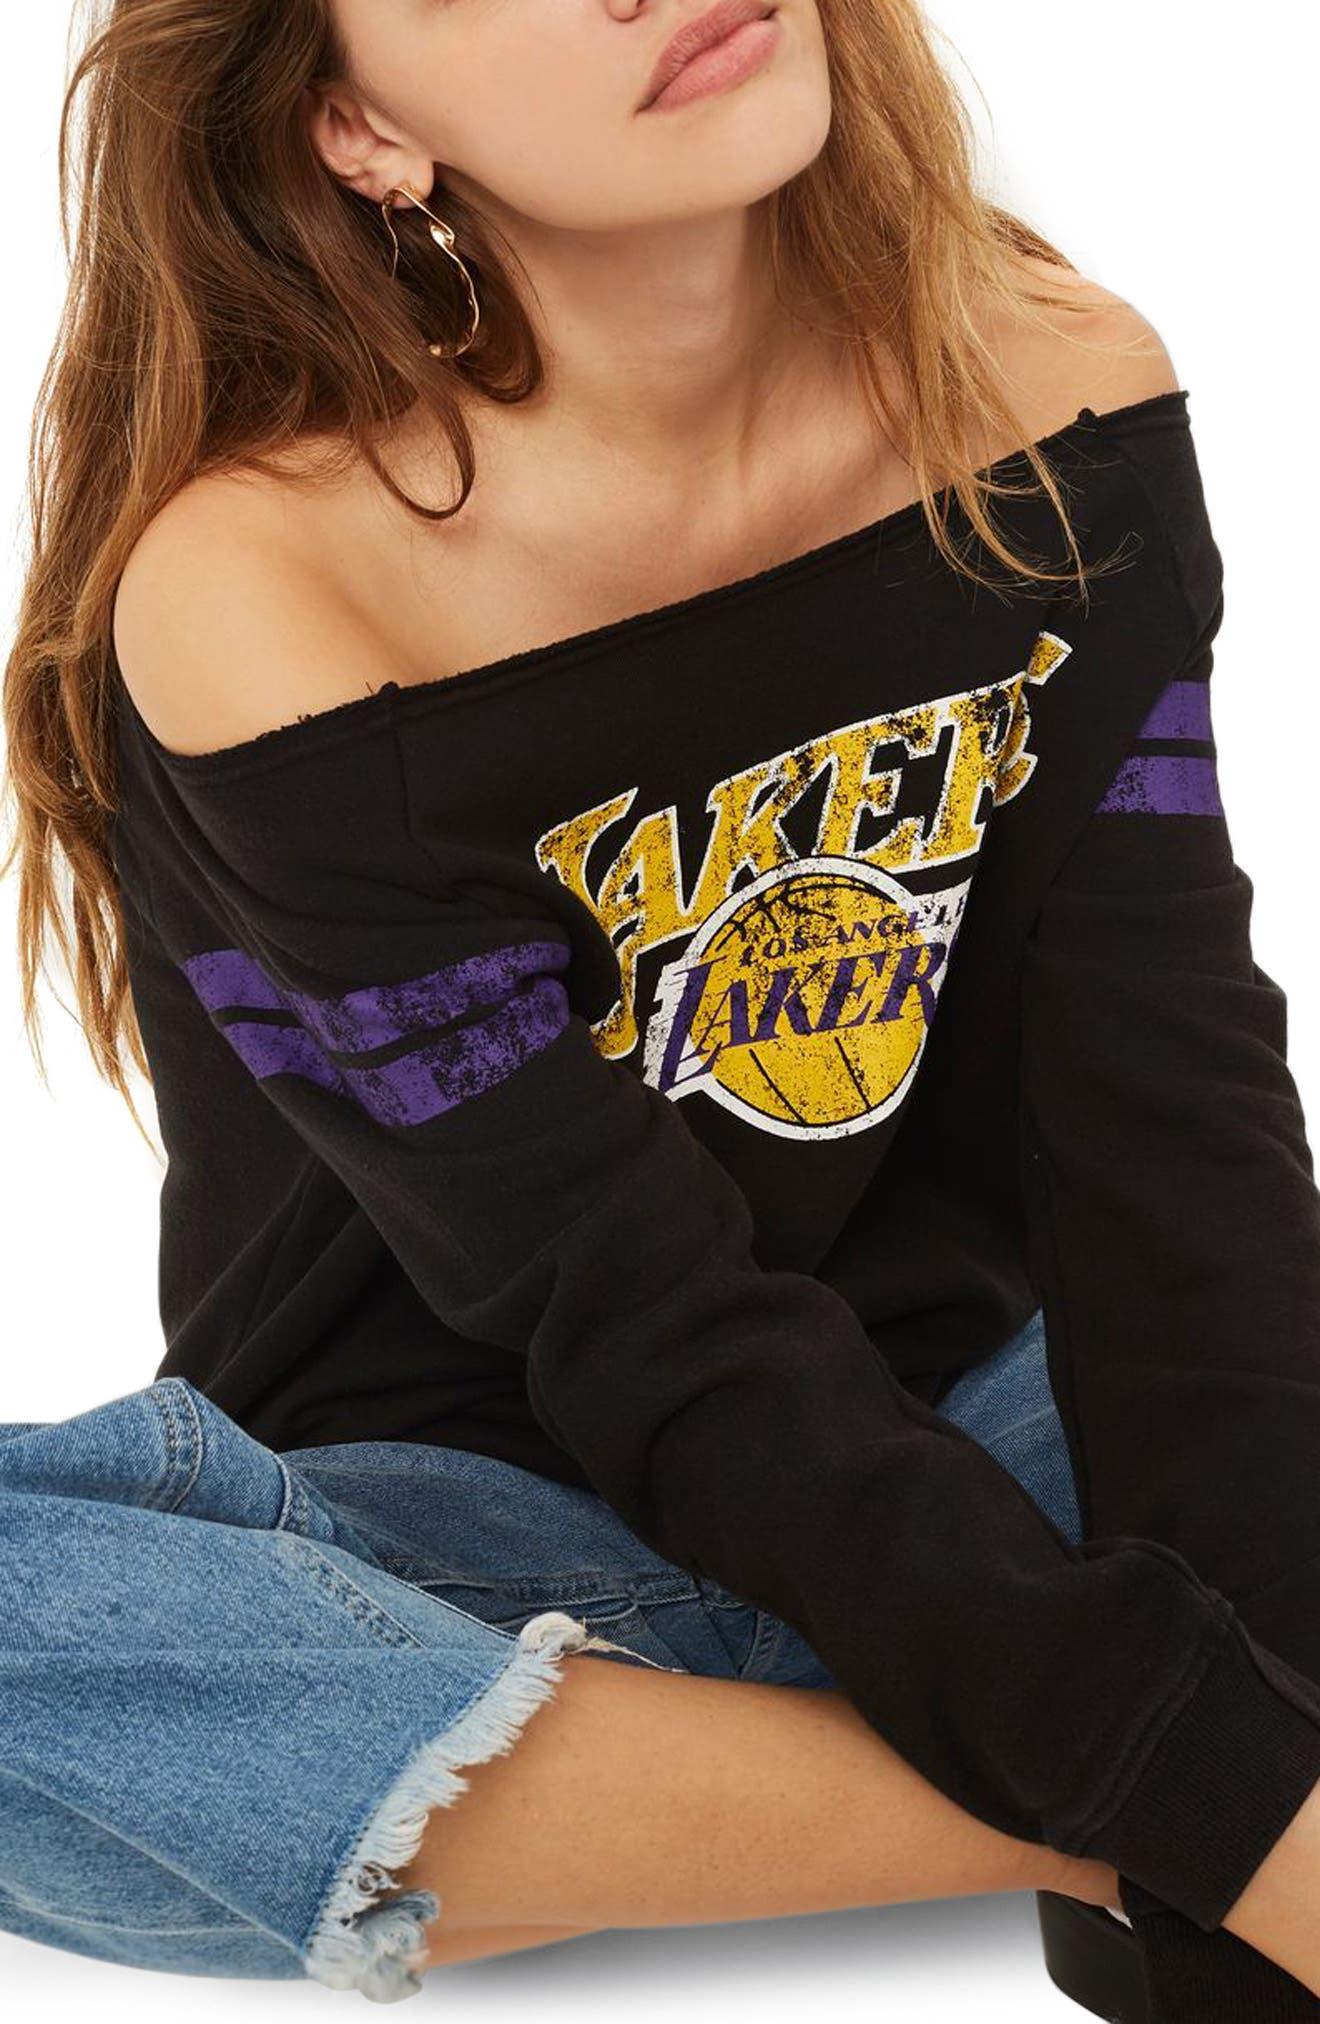 x UNK Lakers Convertible Sweatshirt,                             Main thumbnail 1, color,                             001